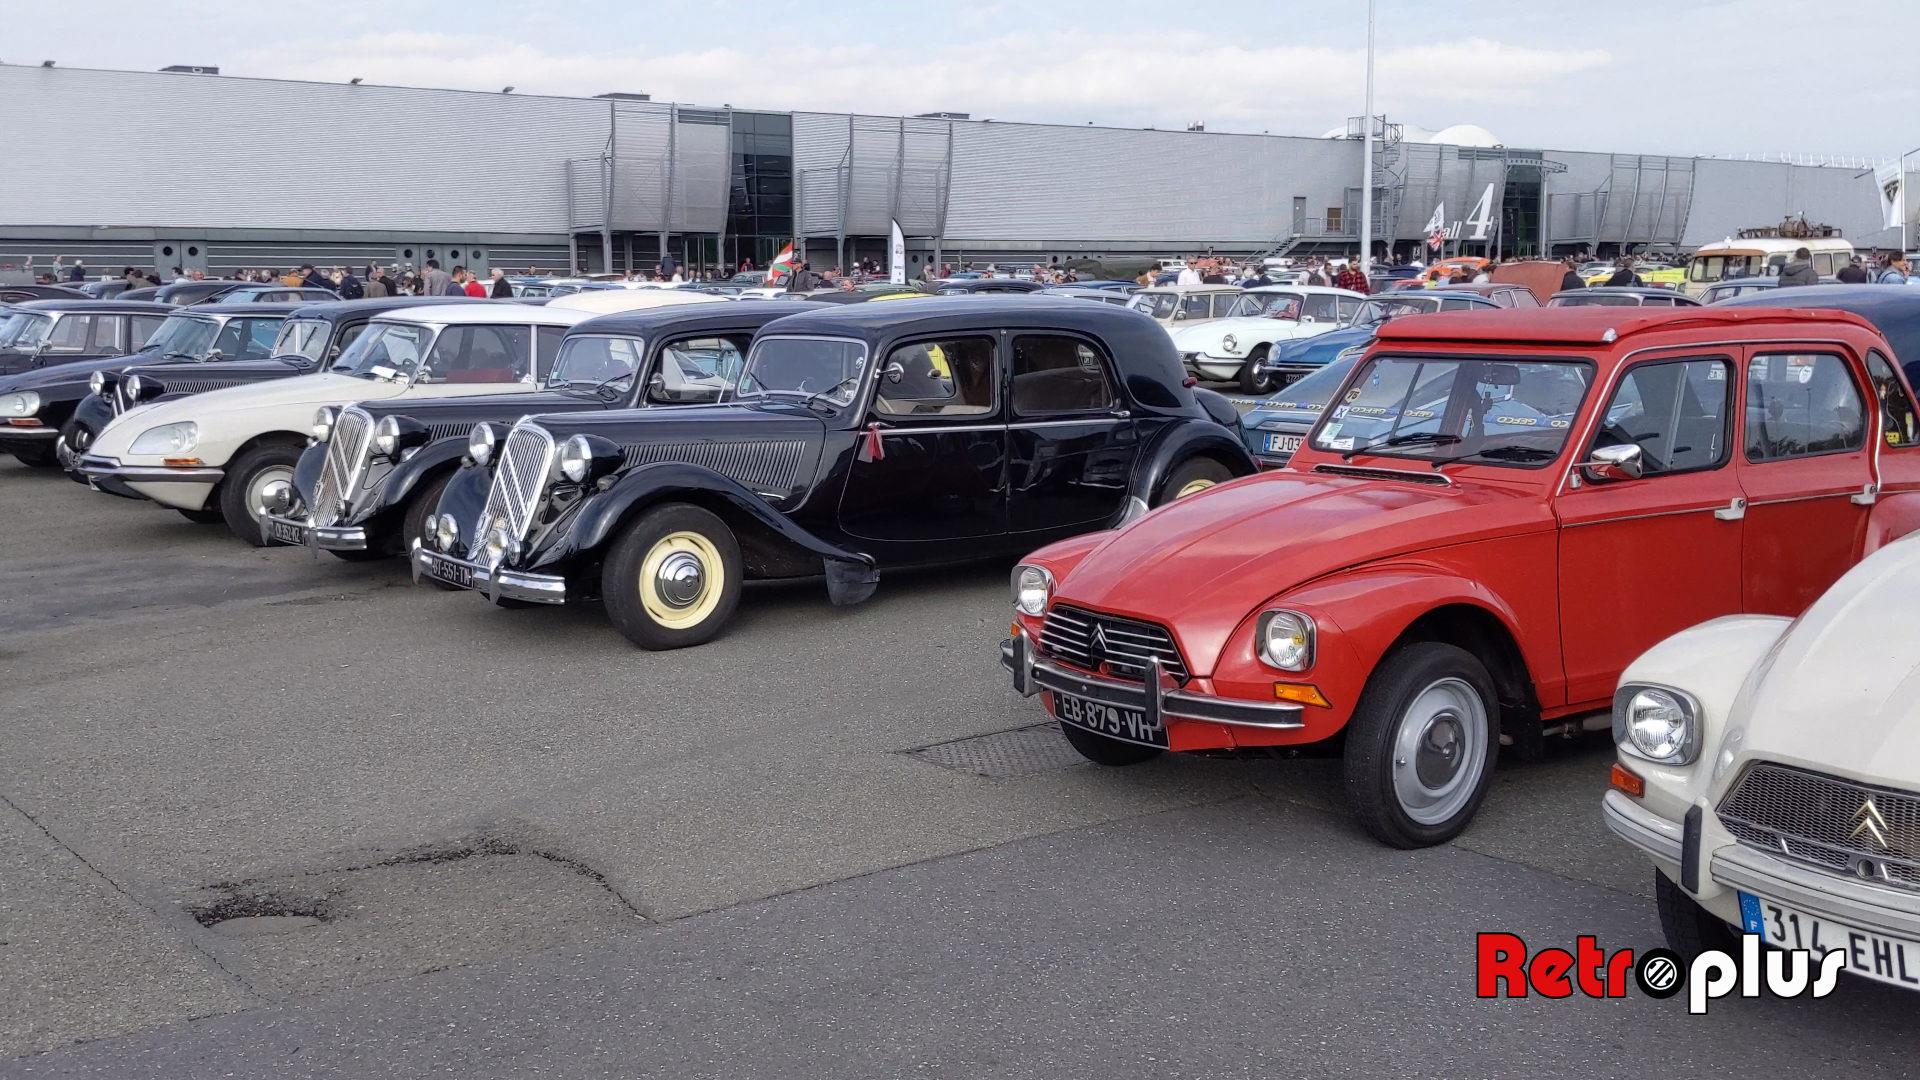 Automedon2019-parkingCitroen24